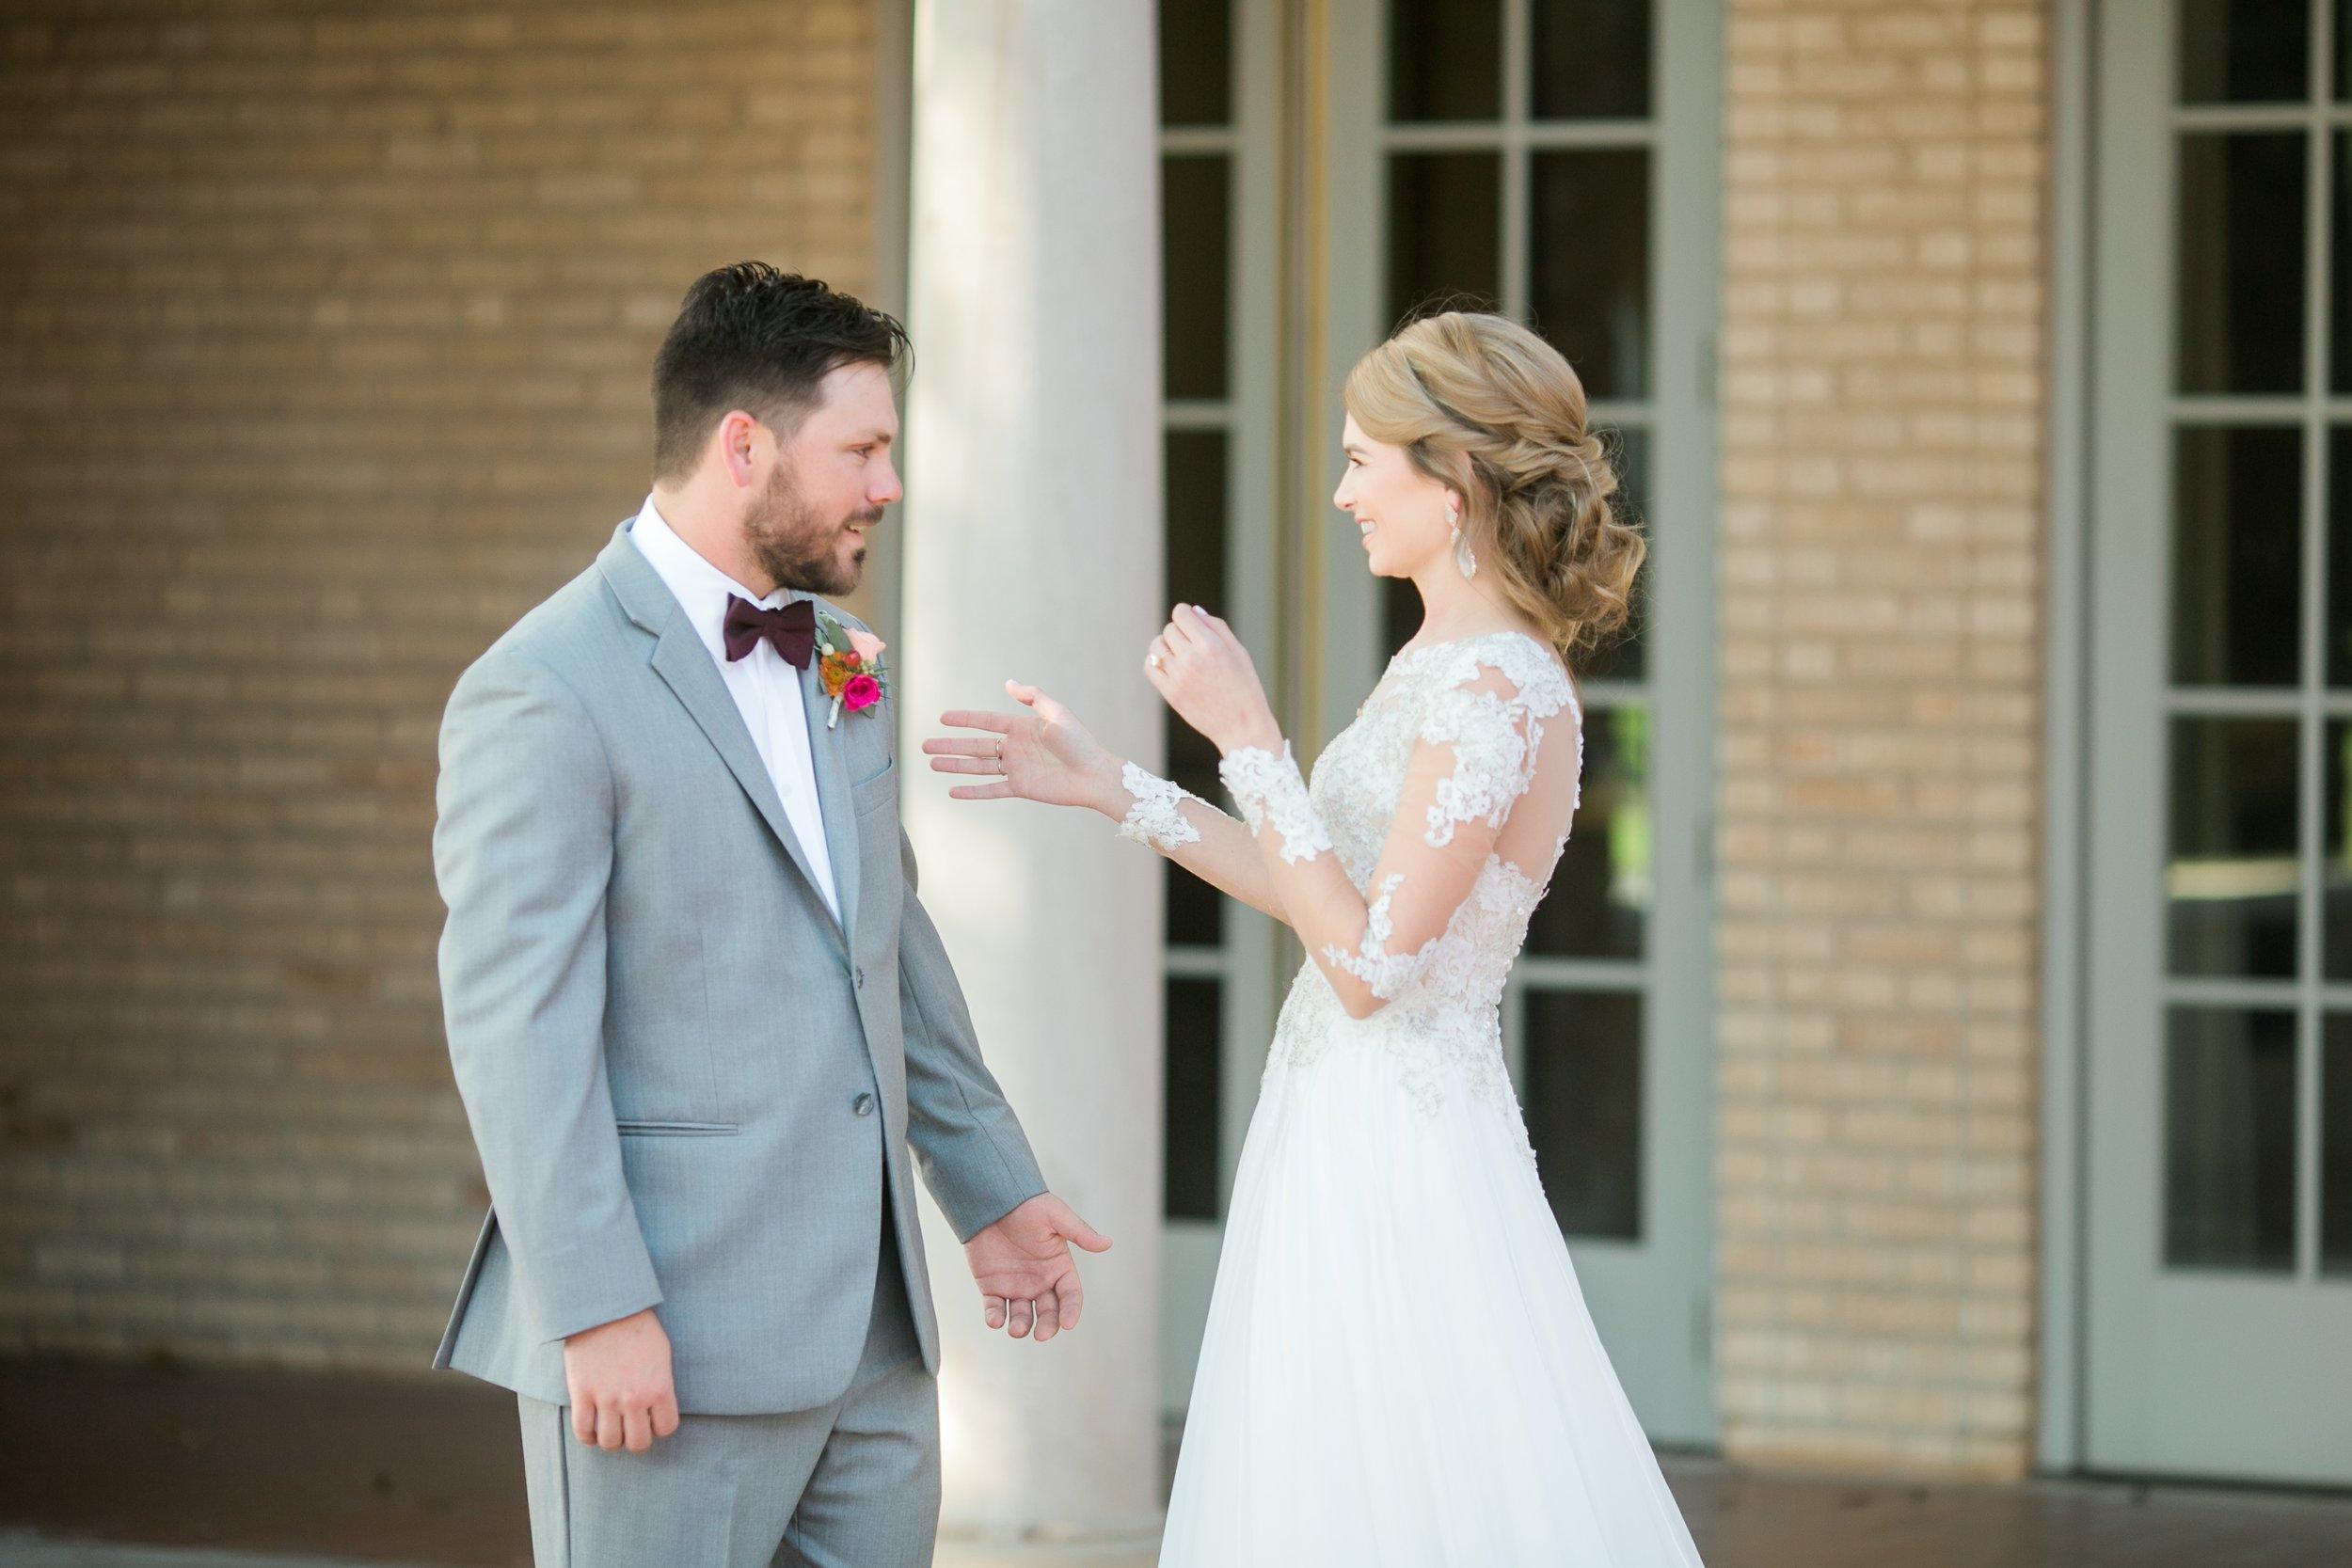 Roberson-Wedding-The-Forum-Lauren-Pinson-Wedding-Photography-Wichita-Falls-Texas-024.jpg